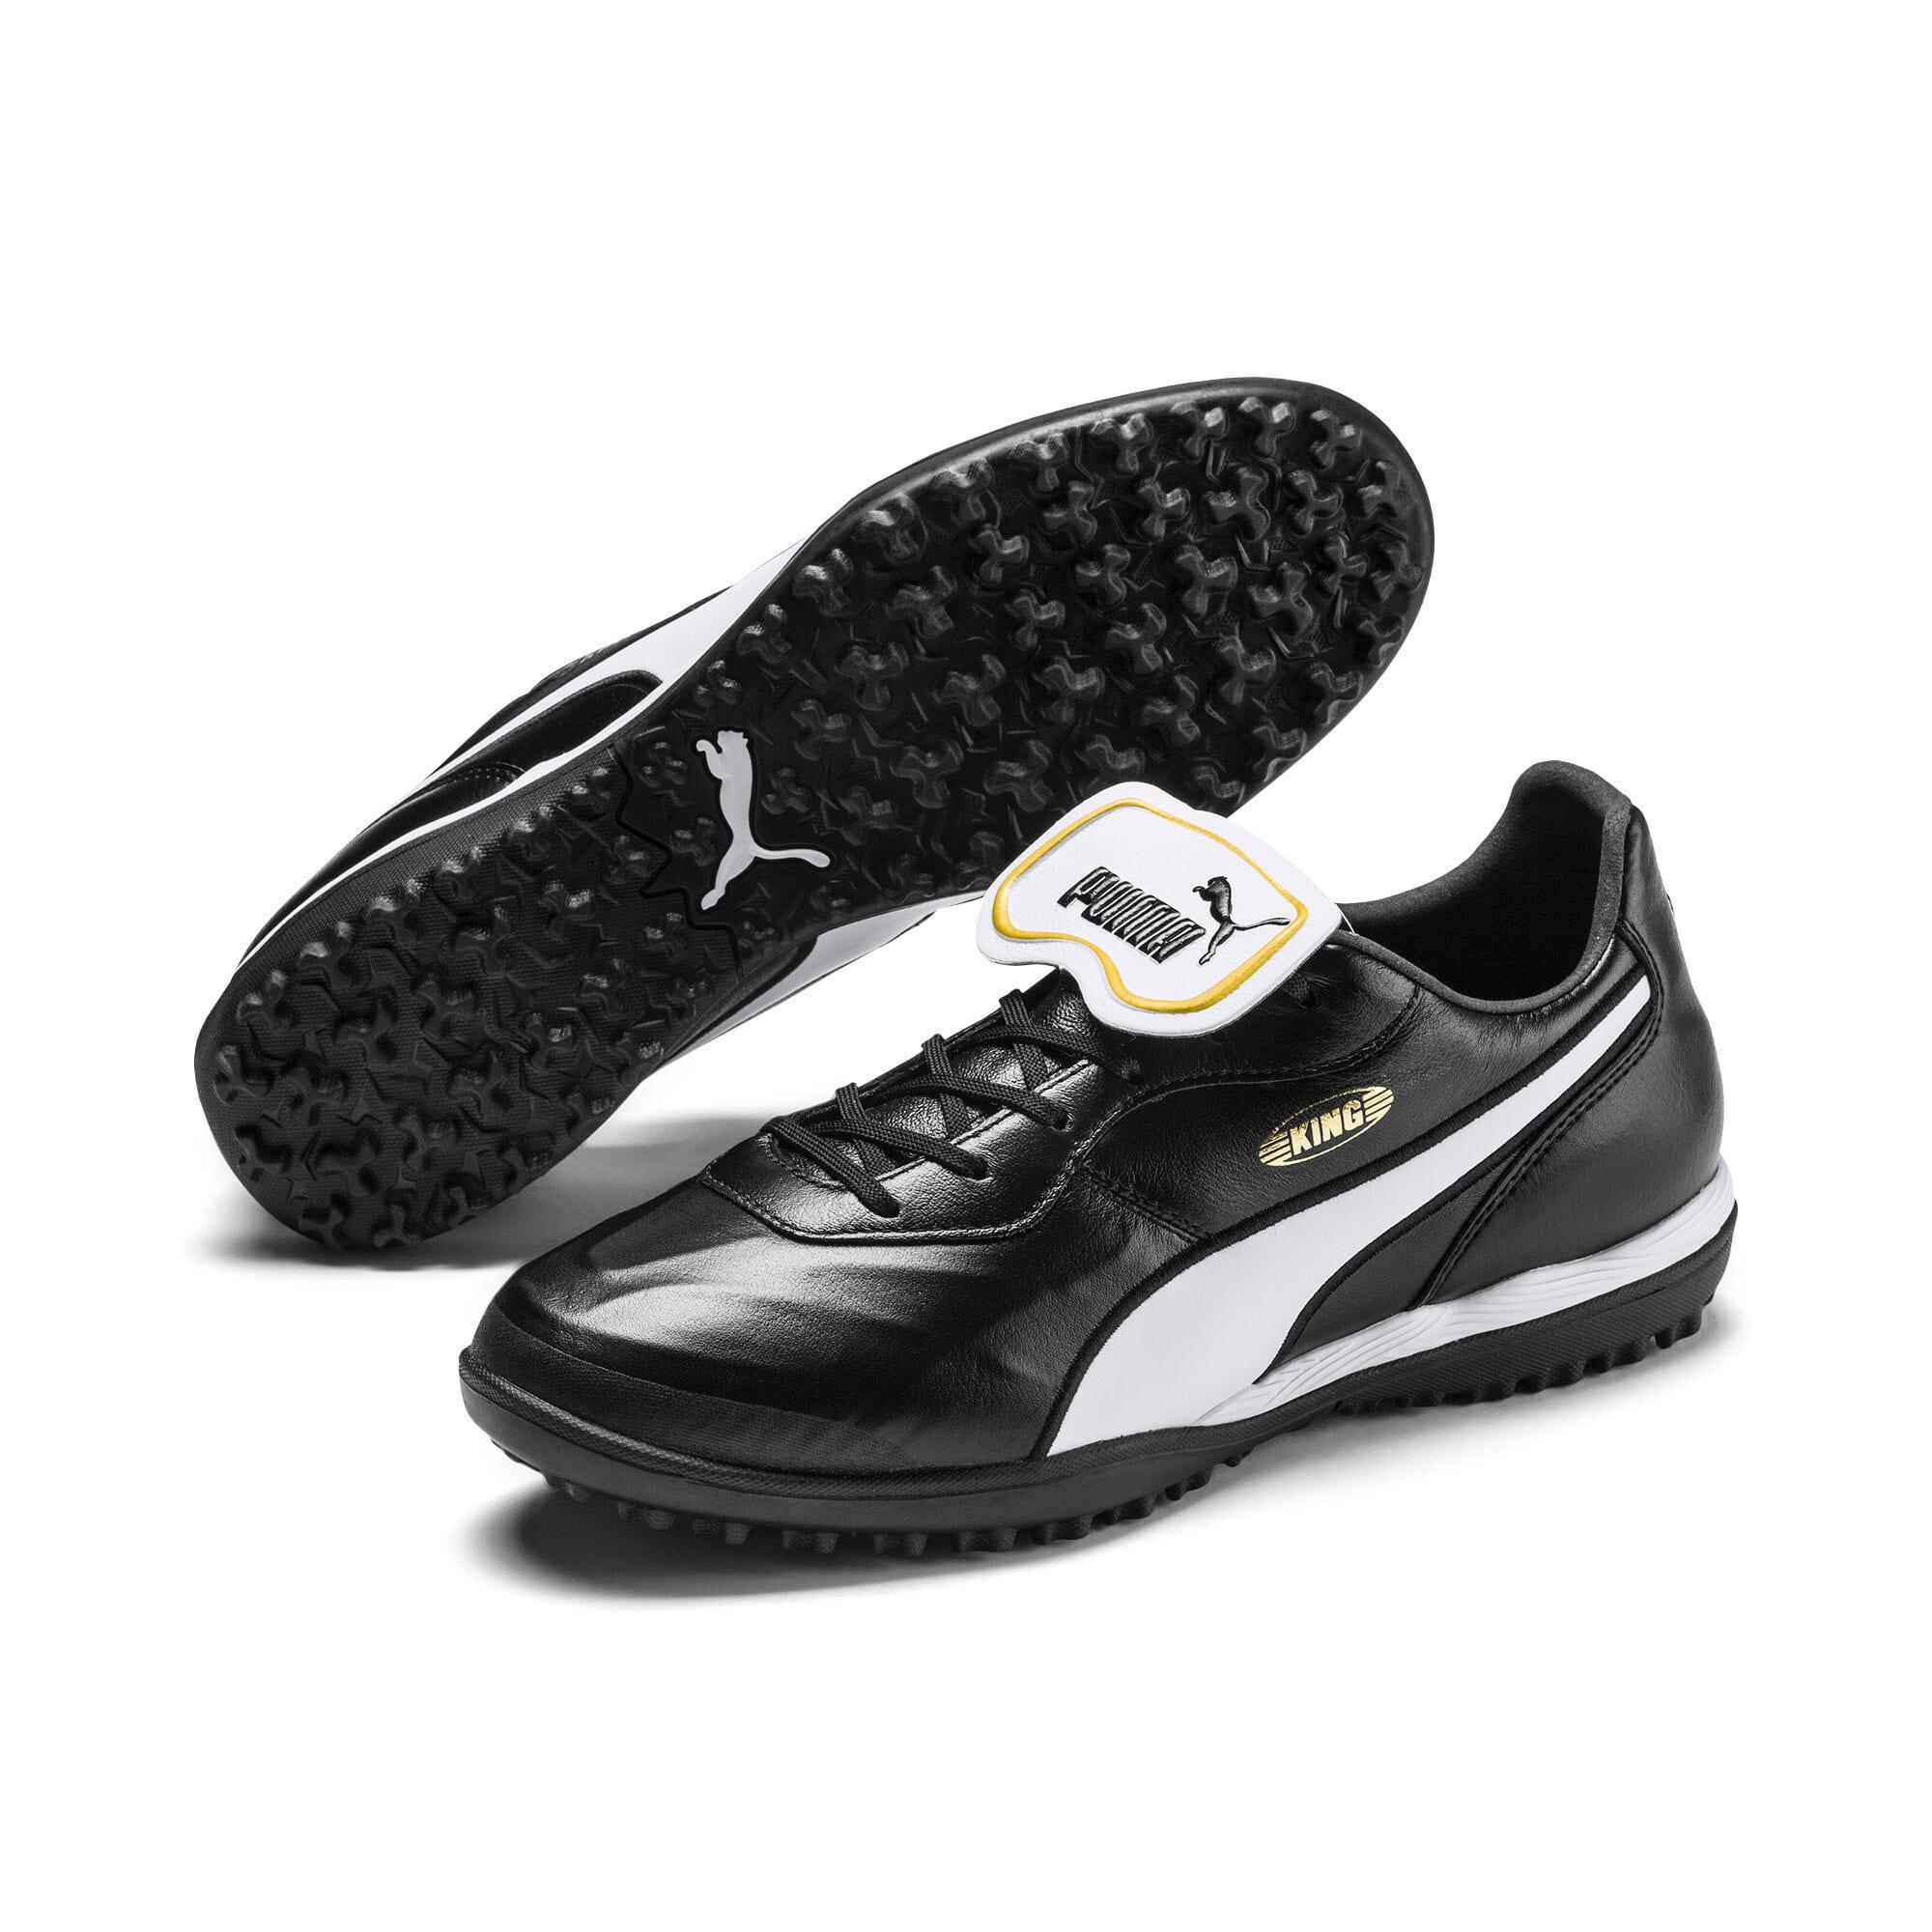 Thumbnail 3 of KING Top TT voetbalschoenen voor heren, Puma Black-Puma White, medium